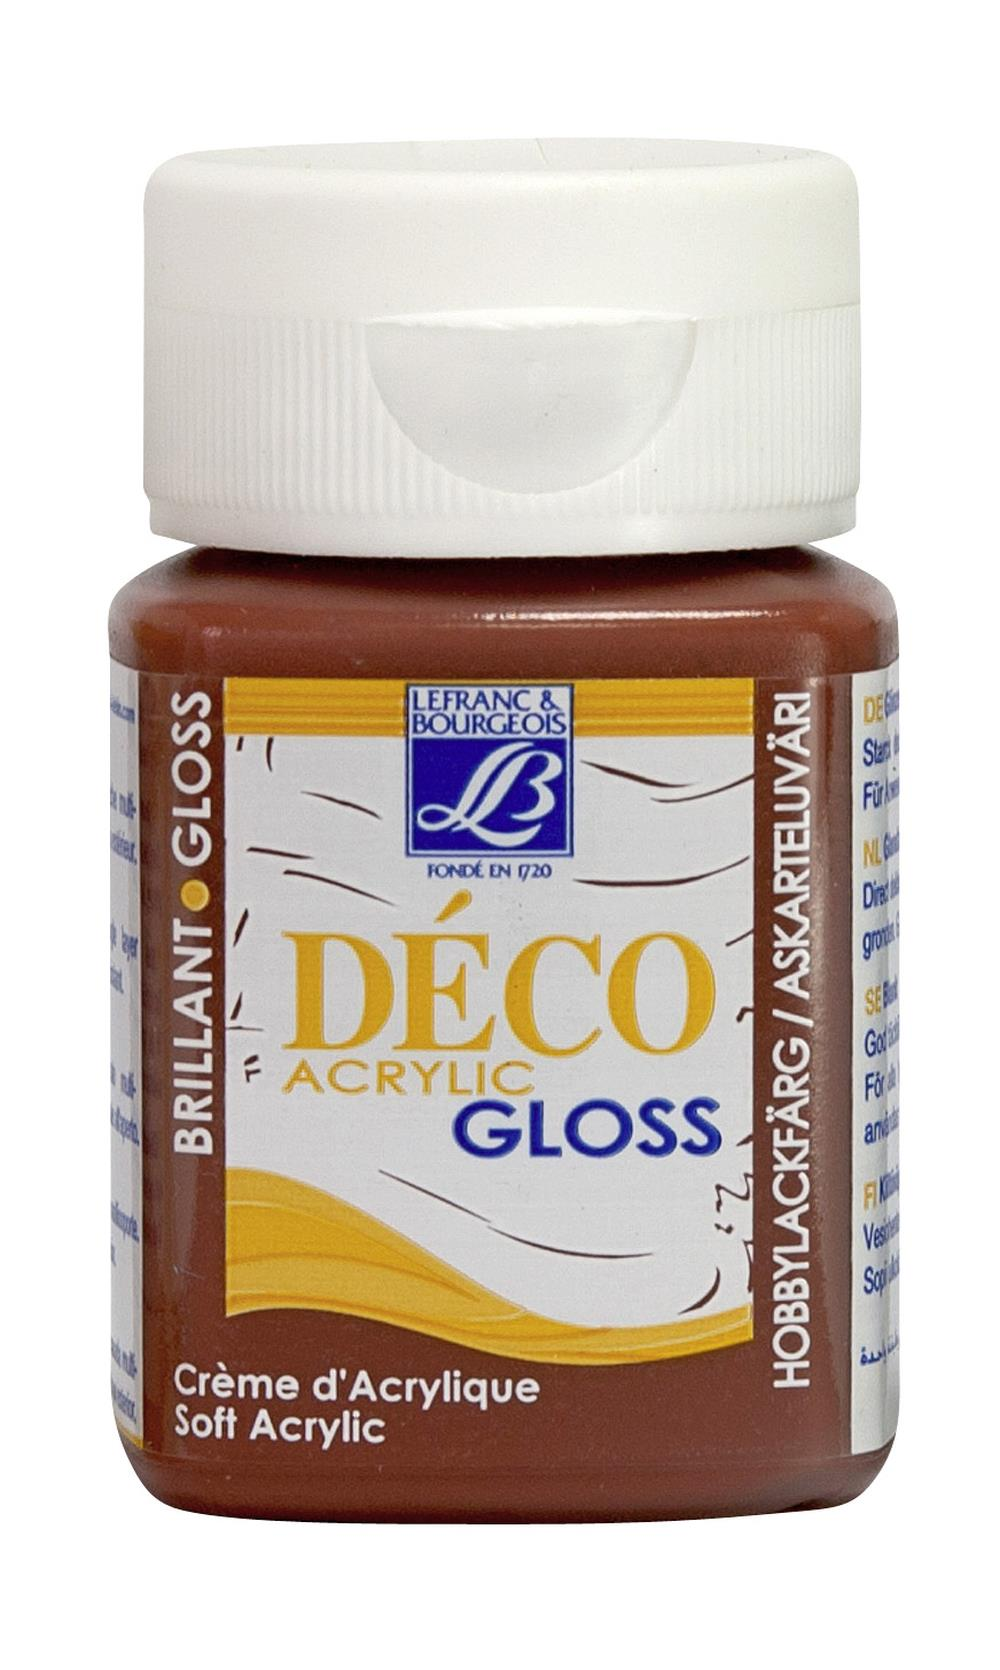 Hobbyfärg L&B Deco Gloss Akryl 50ml  Mahogany 487 (4F) Utgår